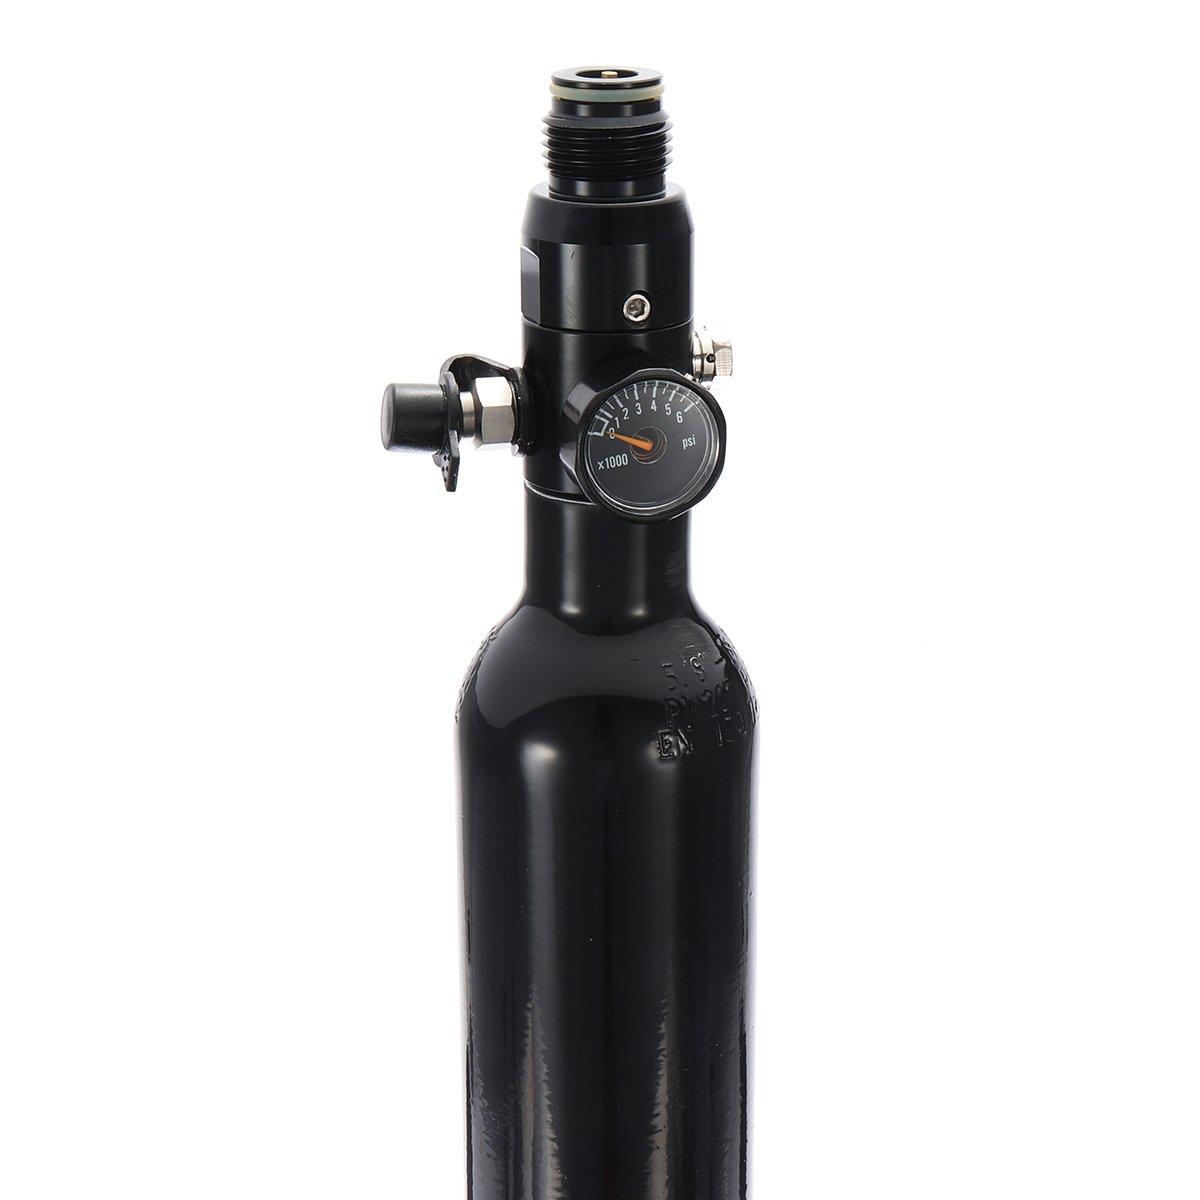 Amazon.com: 0.38L Liter Aluminum Tank Air Bottle With 4500 PSI Regulator For Paintball PCP: Home Improvement